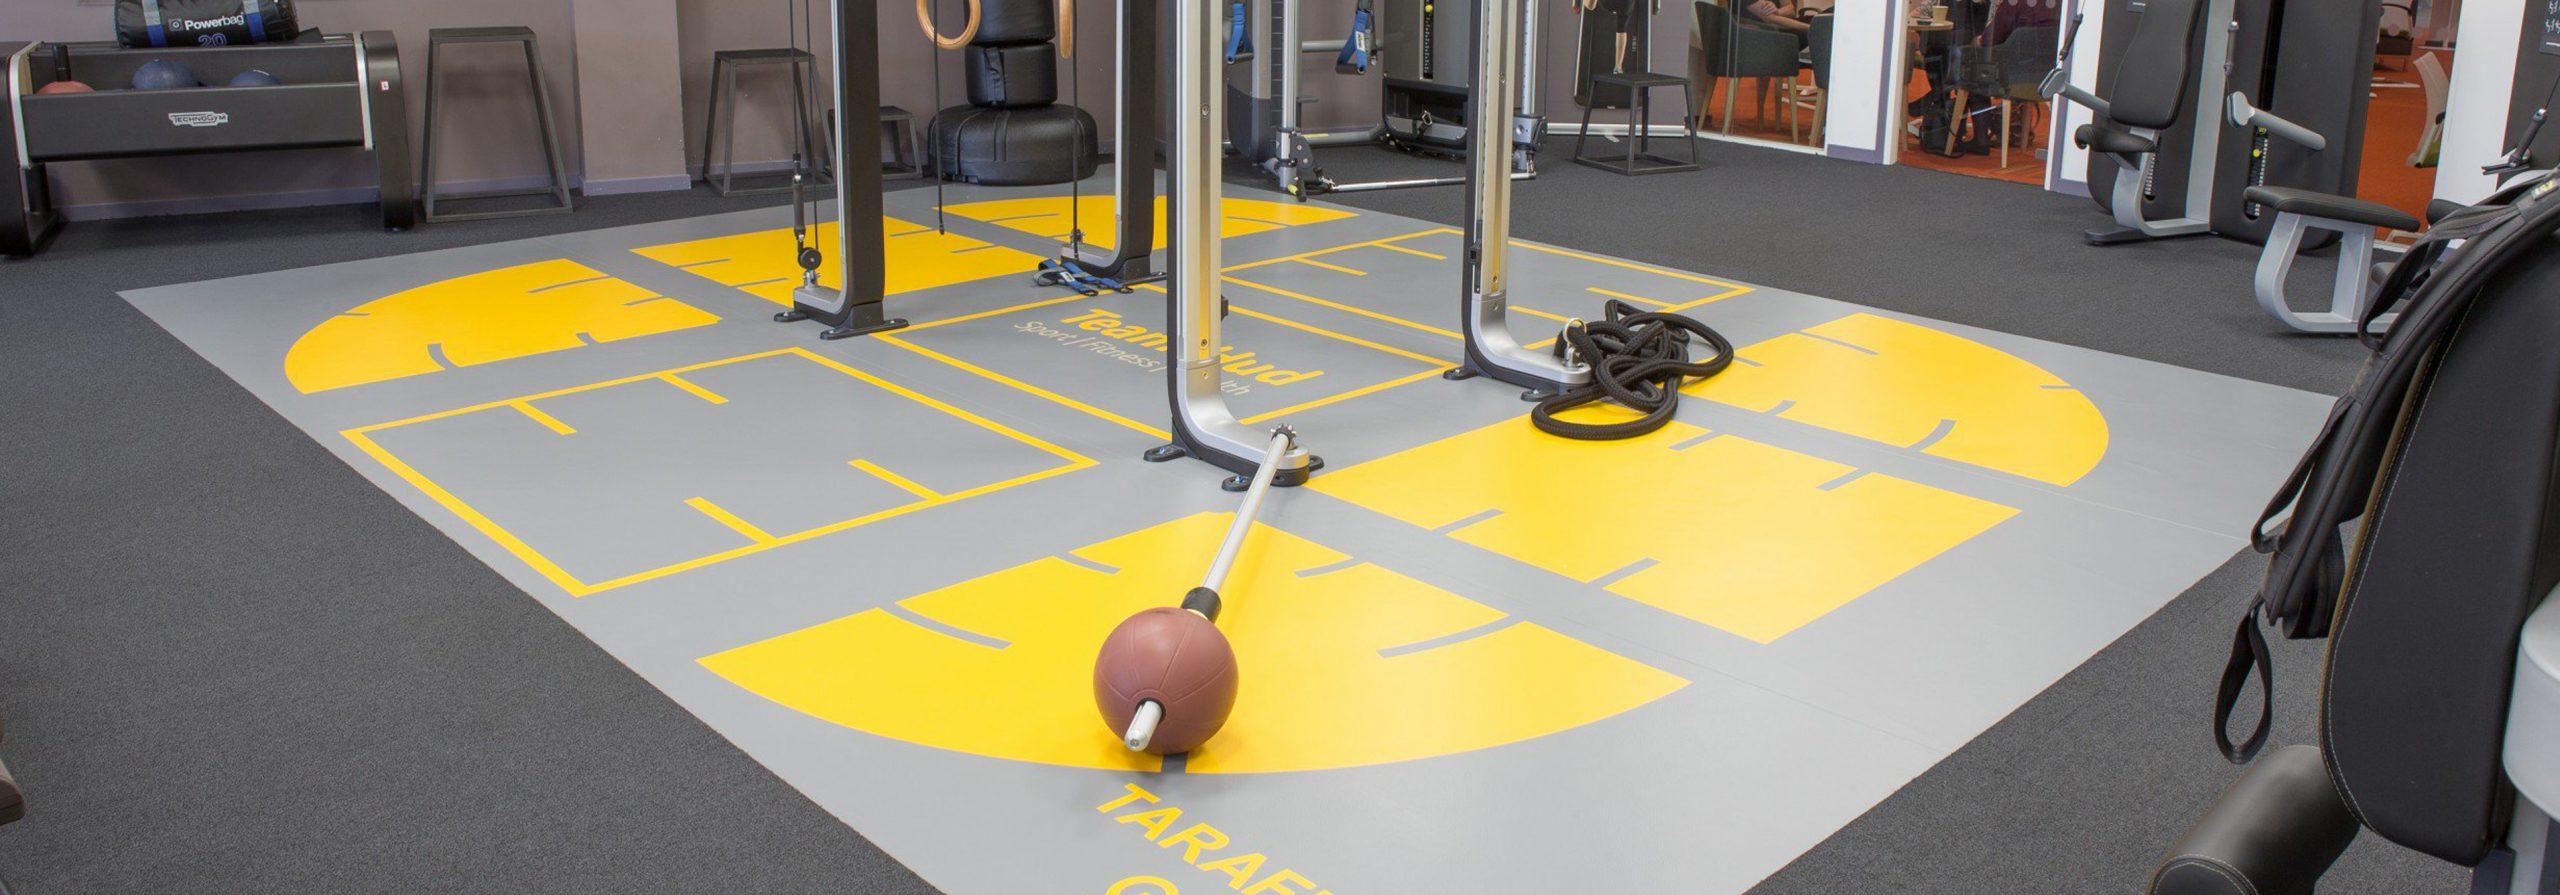 fitness zemin kaplama - sanat yer kaplama